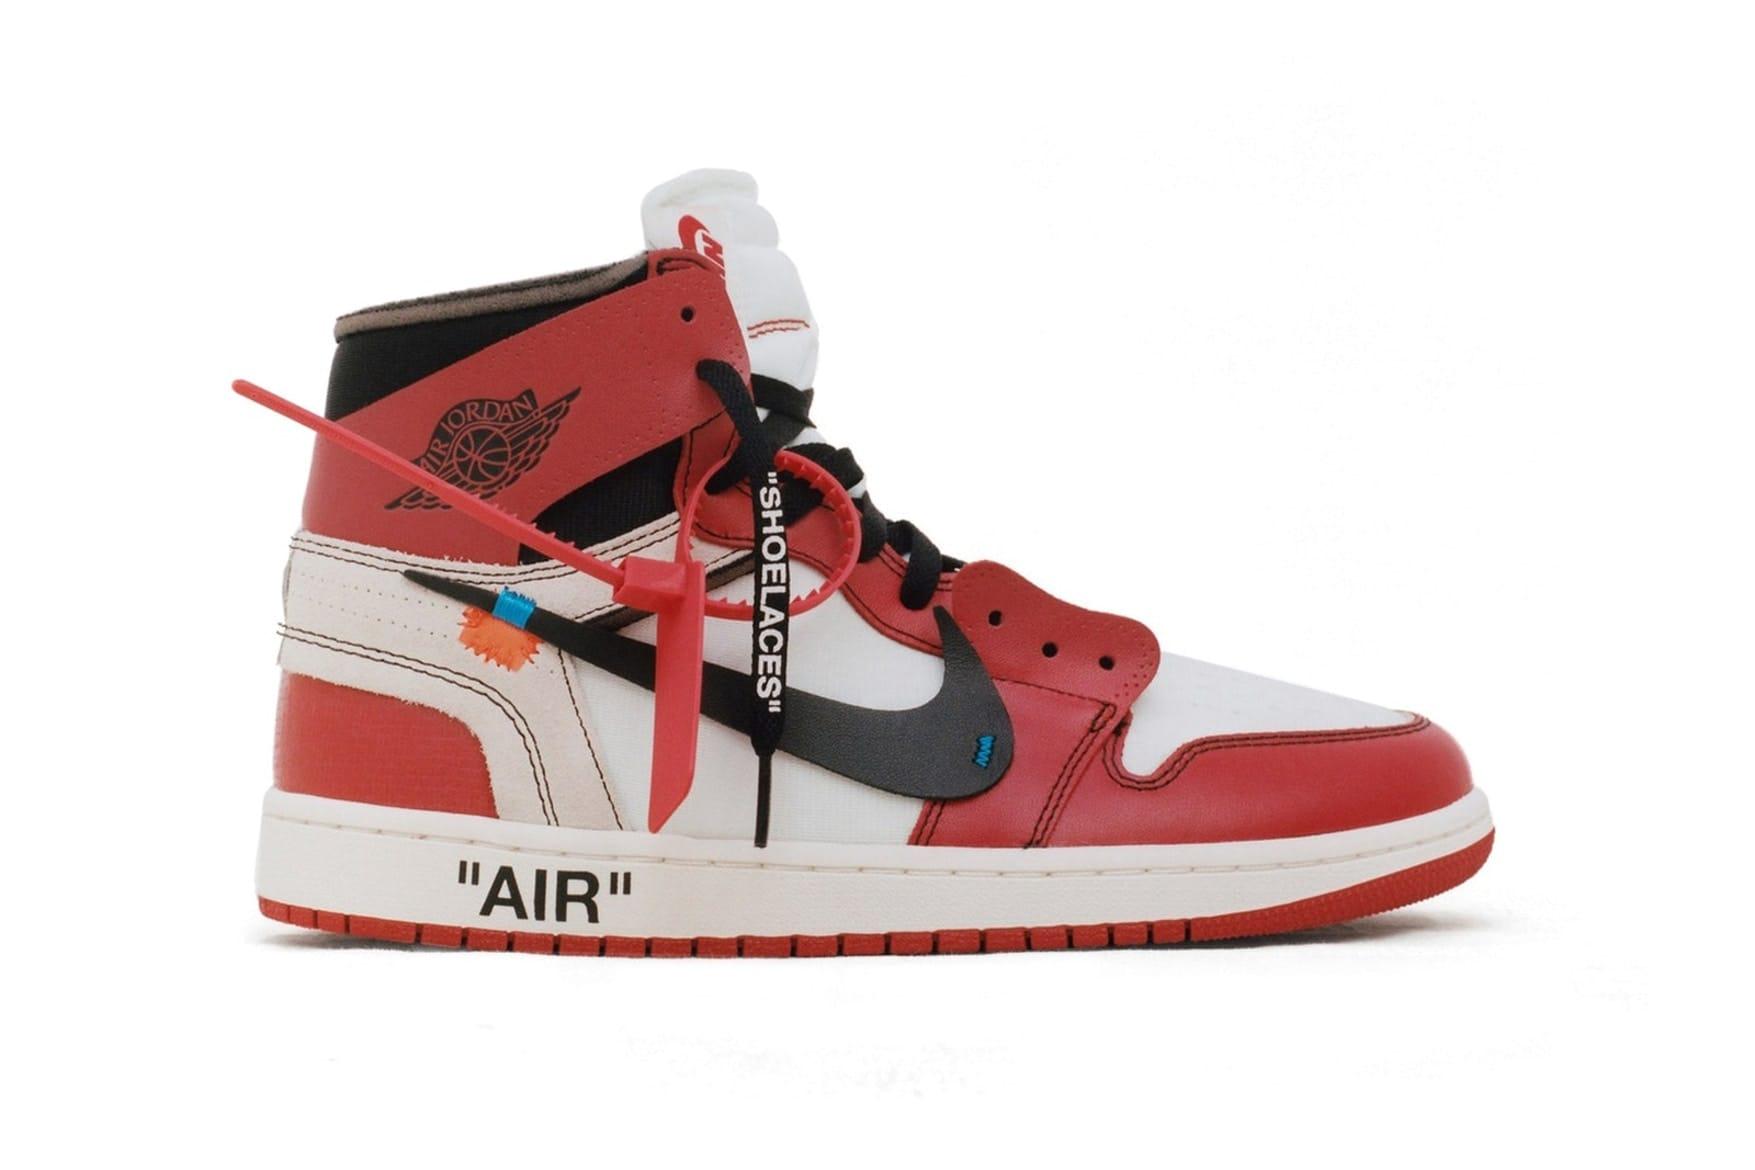 Off-White Virgil Abloh x Air Jordan 1